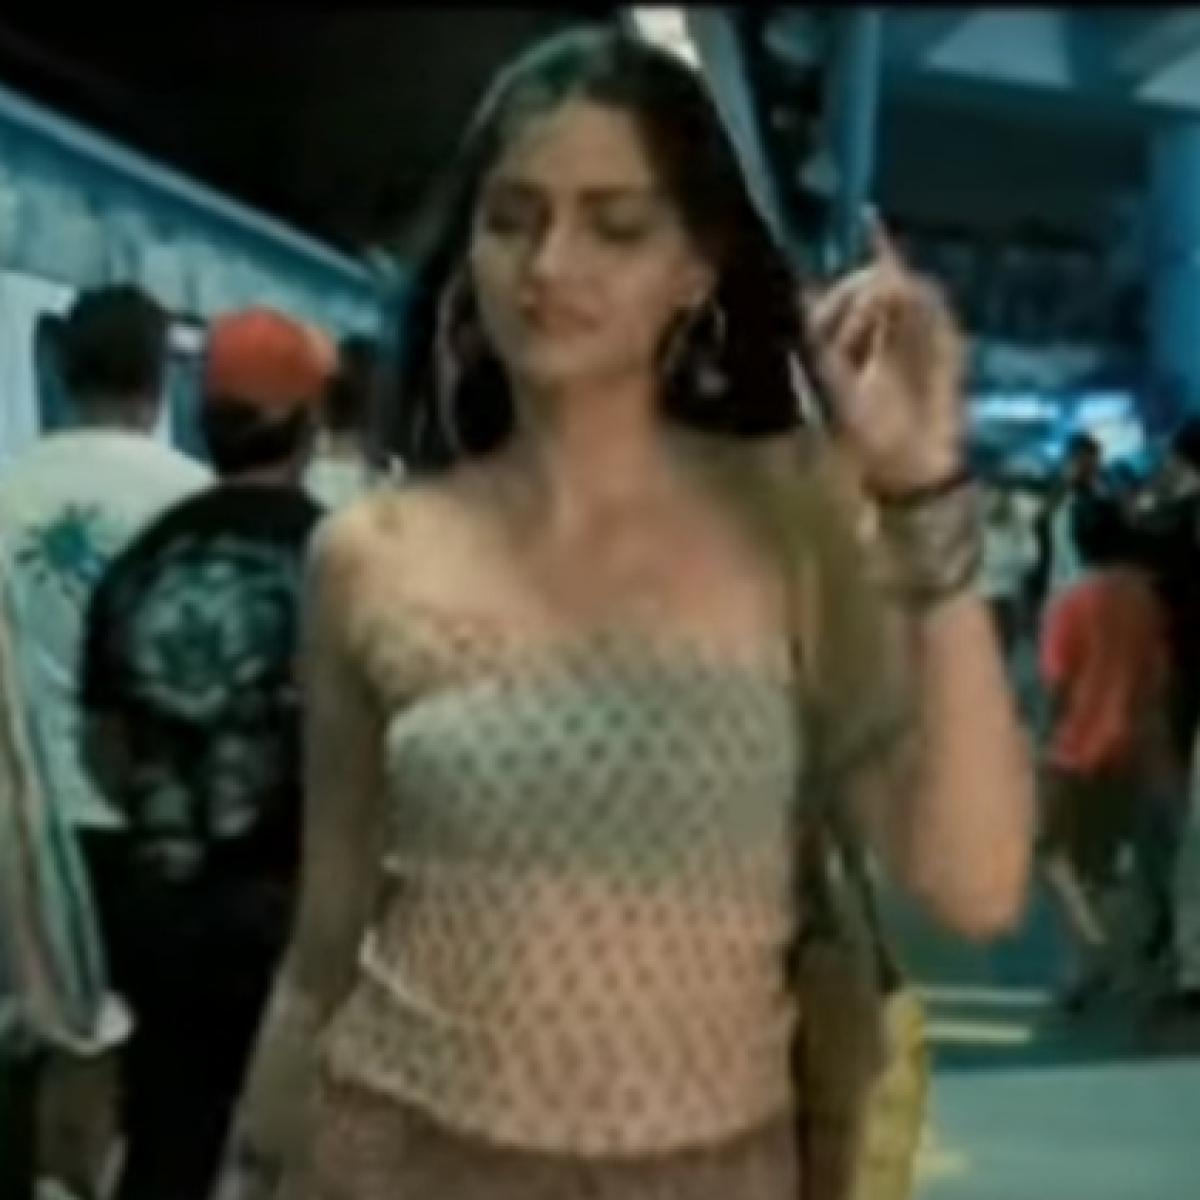 Delhi Metro's hilarious dig at 'Masakali 2.0' is 'more creative than Tanishk Bagchi': Tweeple